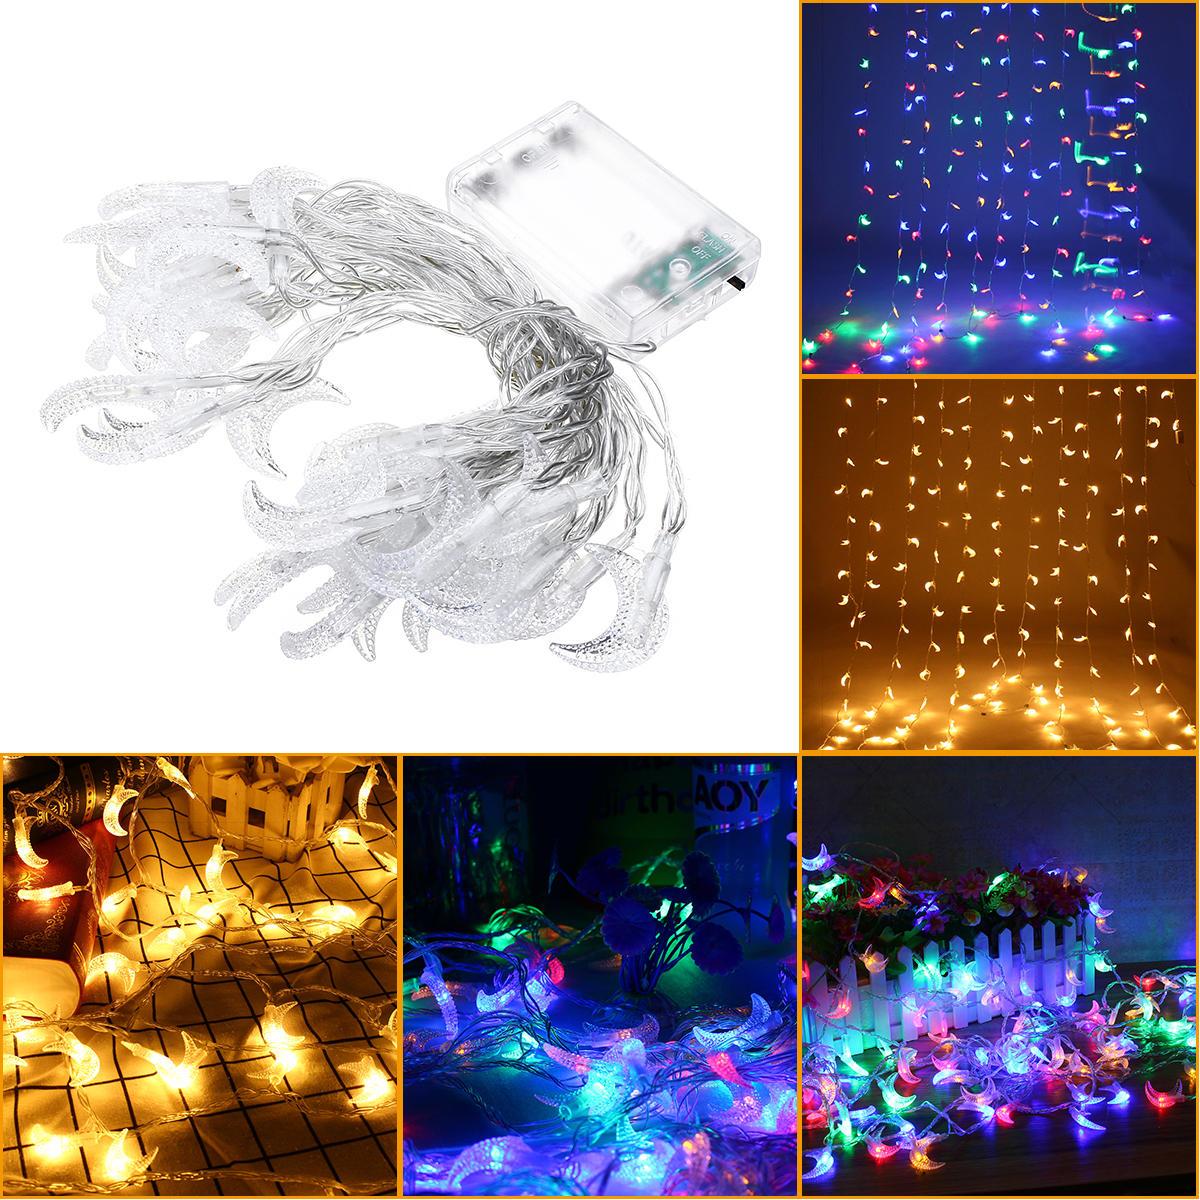 6MムーンシェイプウォームホワイトColorful 40 LEDストリングフェアリーライトウェディングホリデーデコレーション